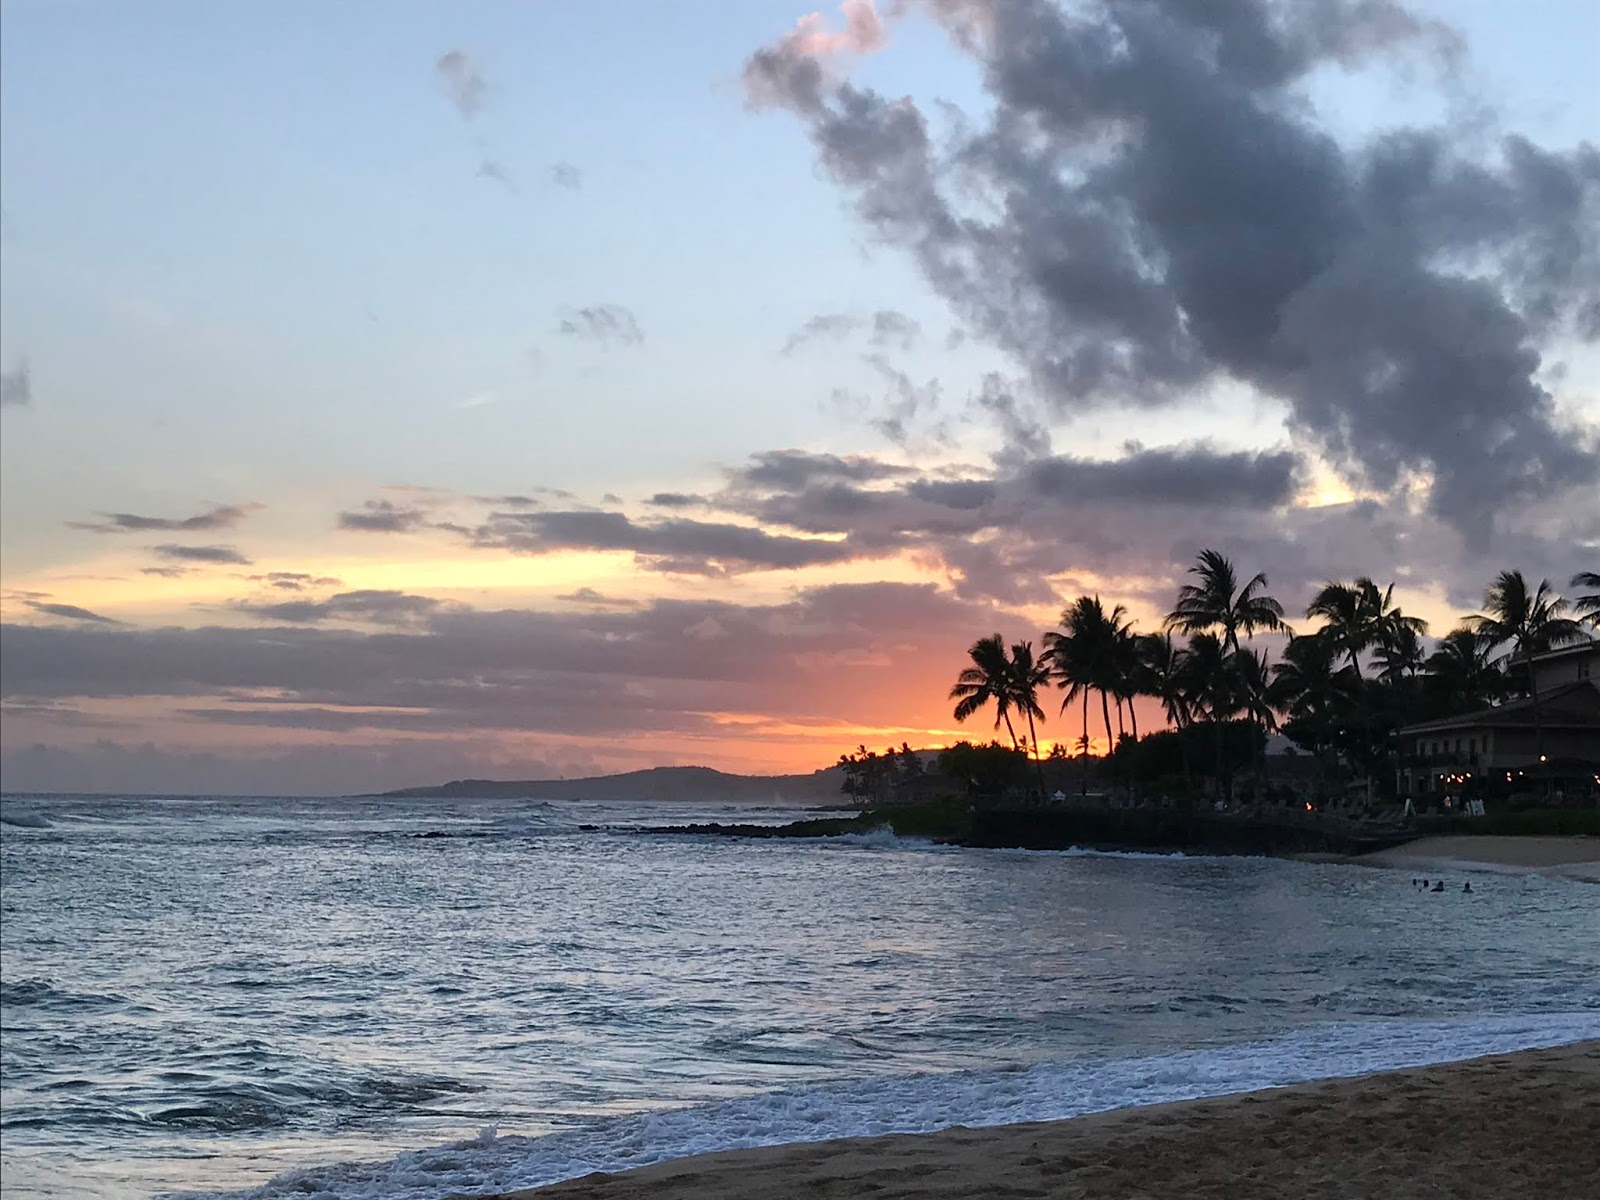 Sunset from Poipu Beach | Where to Watch the Sunset in Kauai | Kauai Itinerary | A Memory of Us